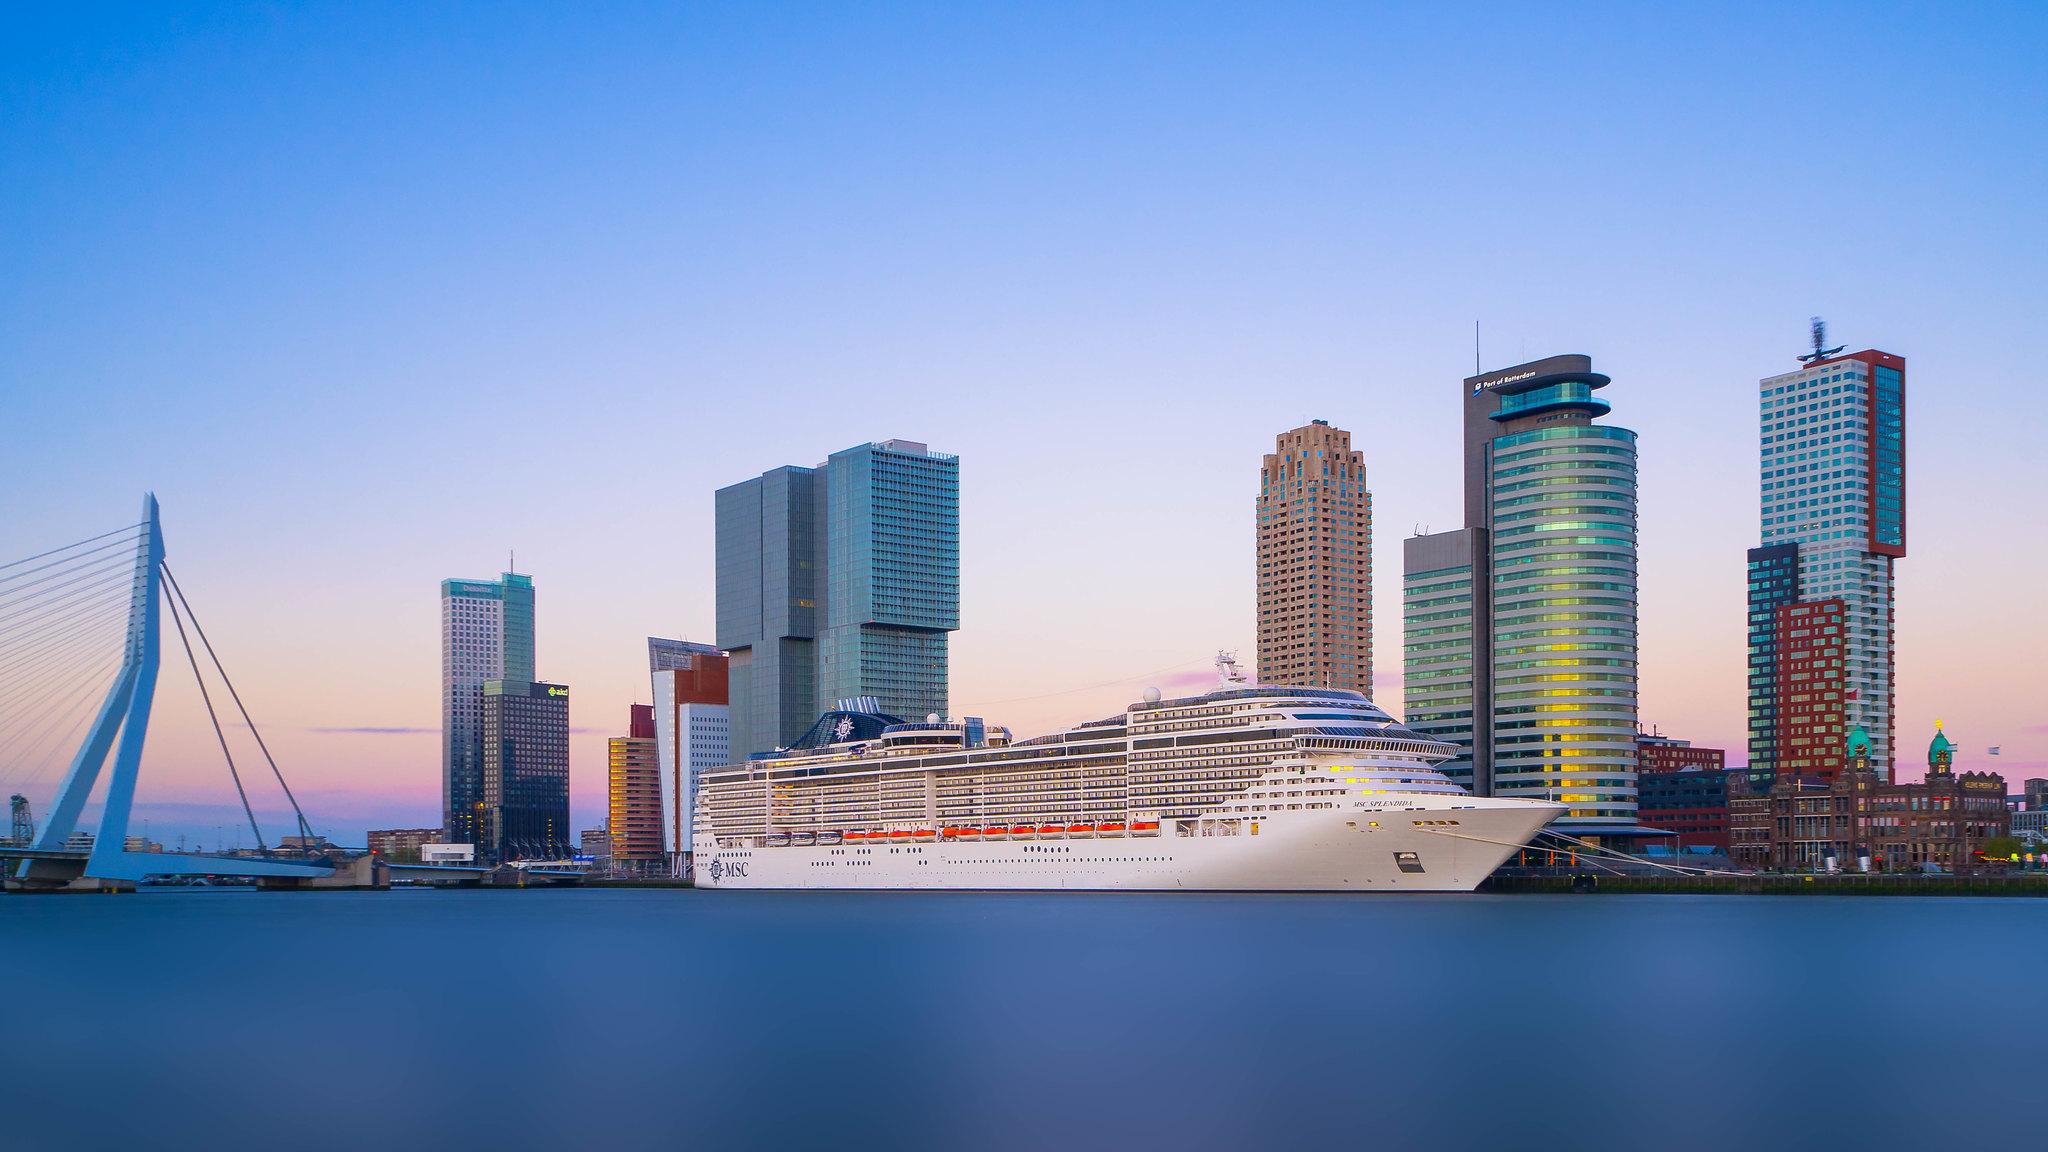 Rotterdam, Netherlands [2048x1152]